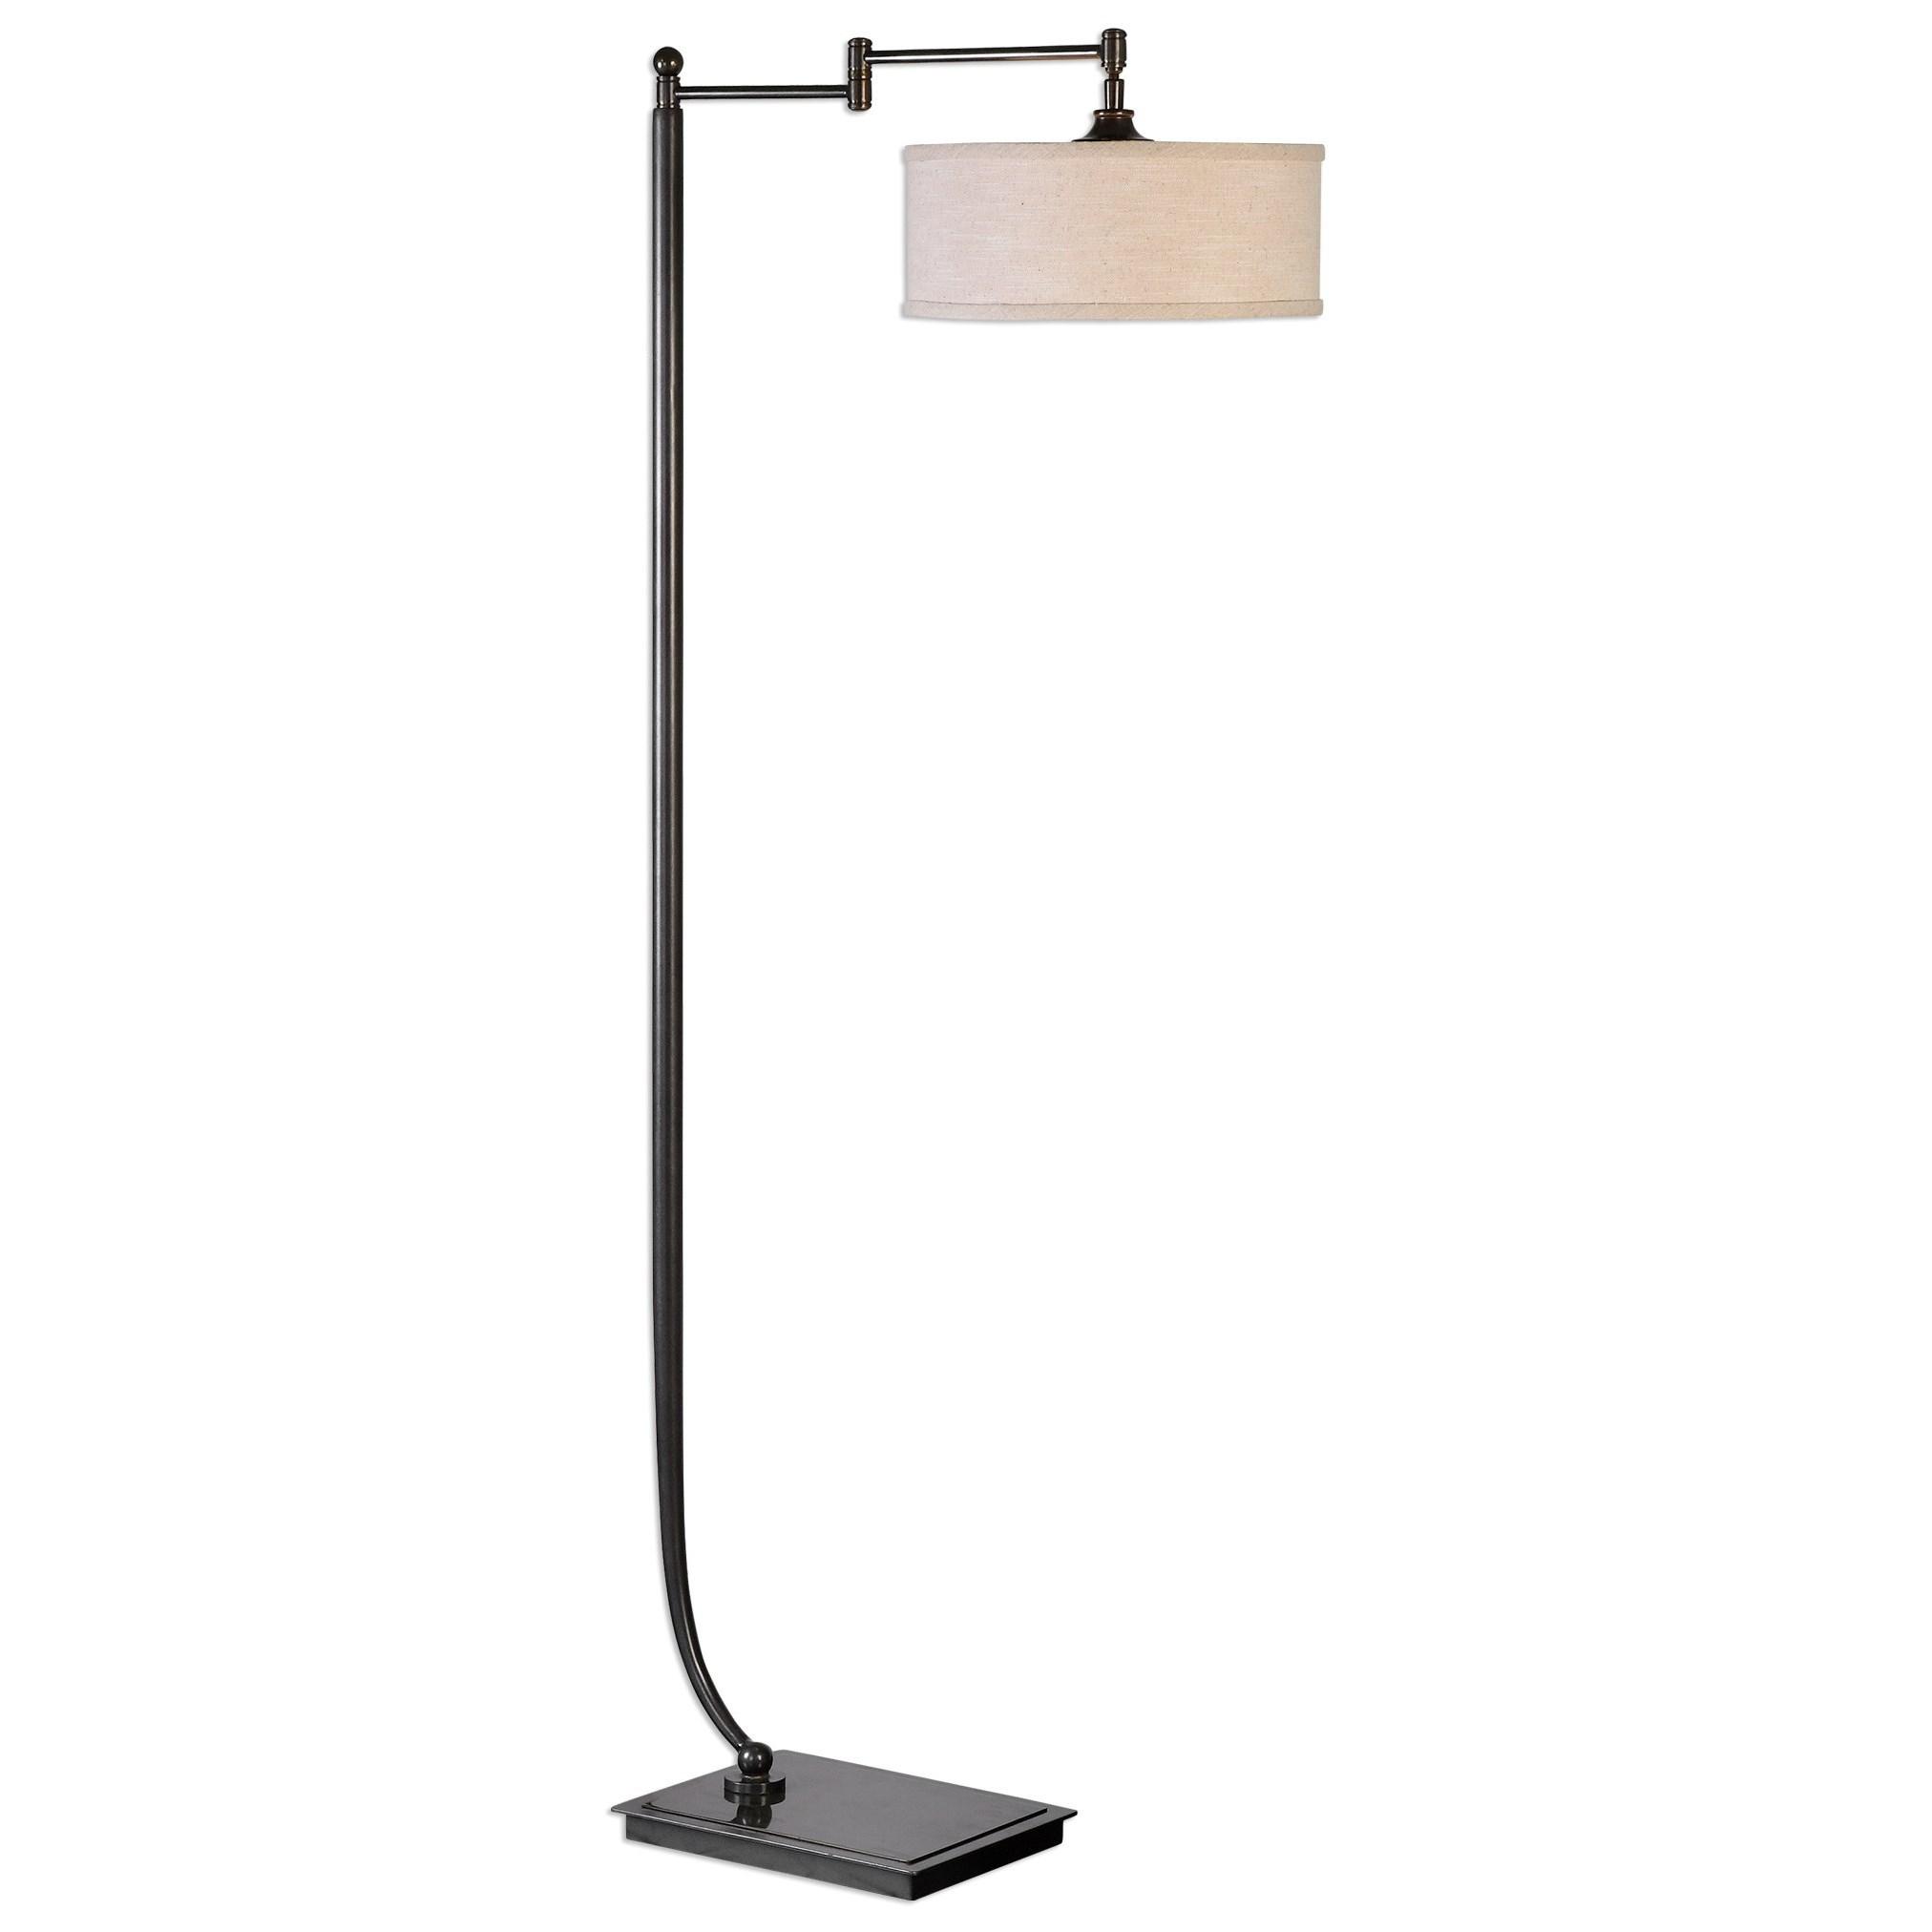 Floor Lamps Lamine Dark Bronze Floor Lamp by Uttermost at Mueller Furniture